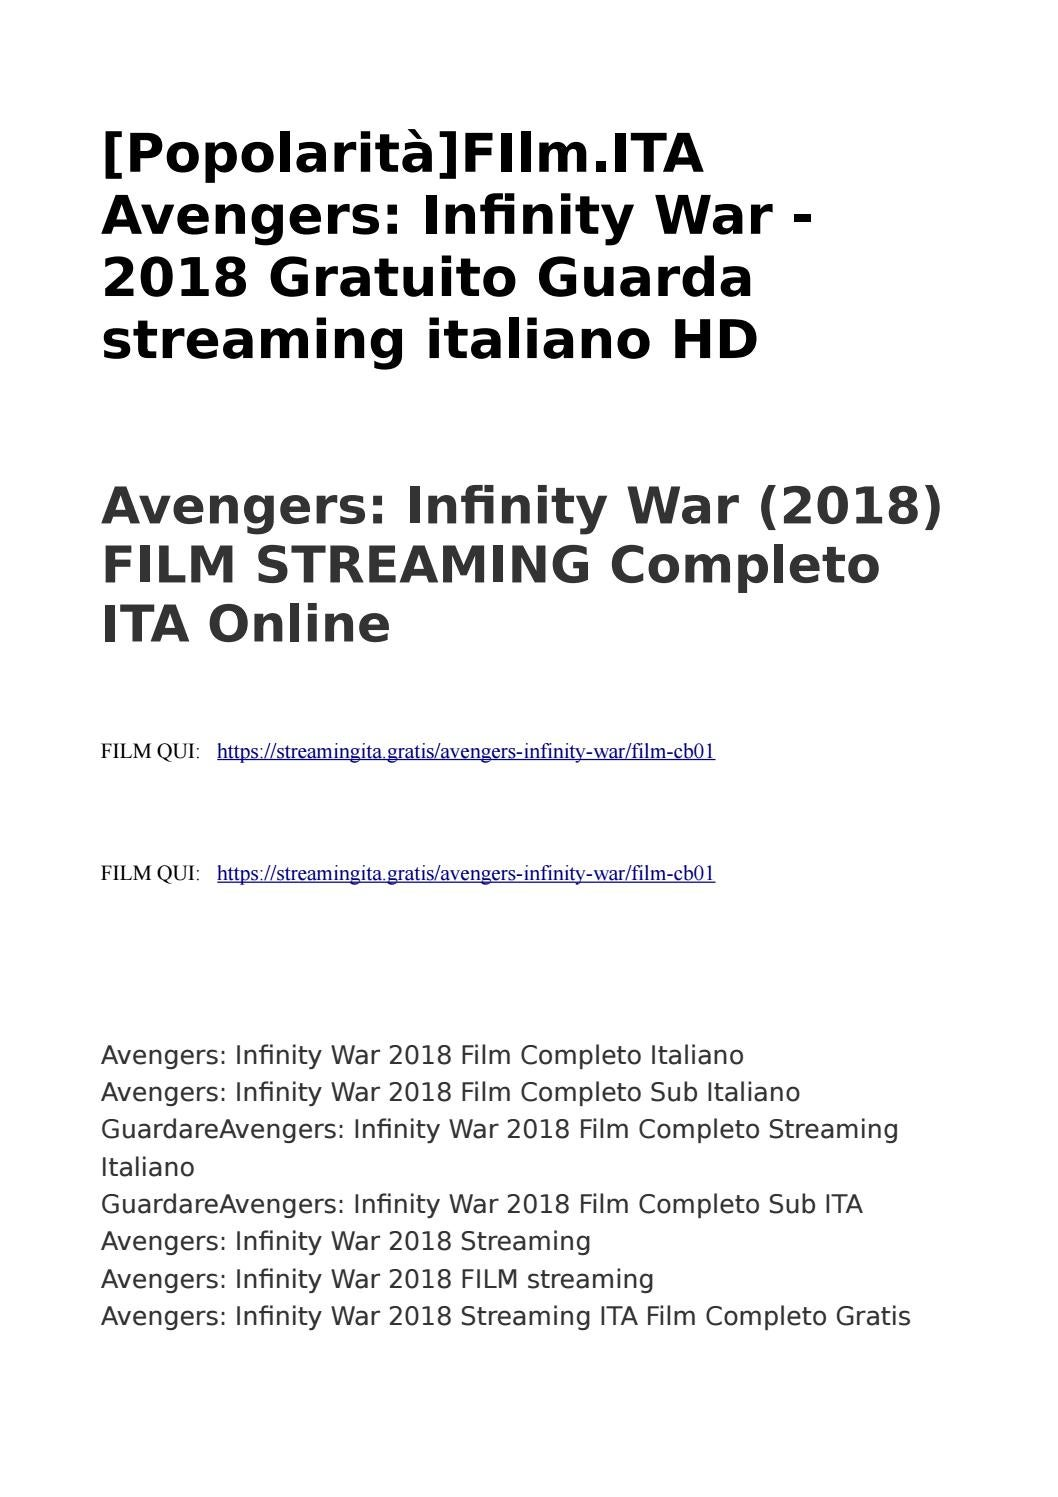 avenger infinity war streaming ita